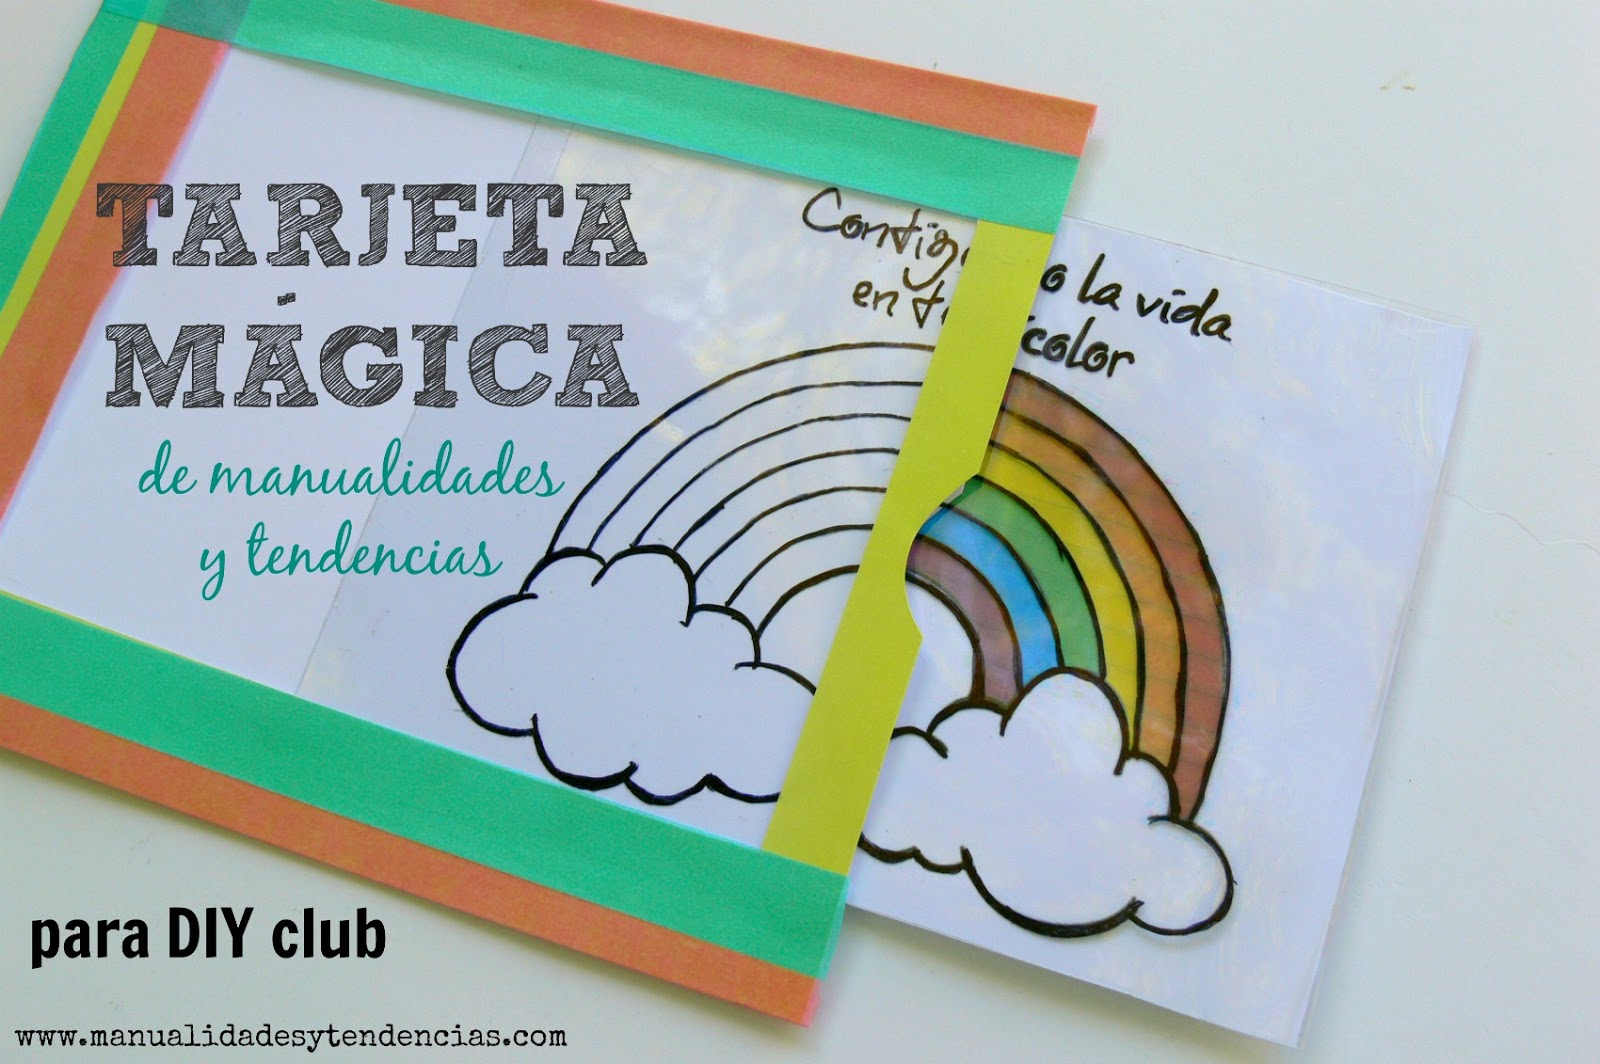 Tarjeta mágica - Handbox Craft Lovers | Comunidad DIY, Tutoriales ...